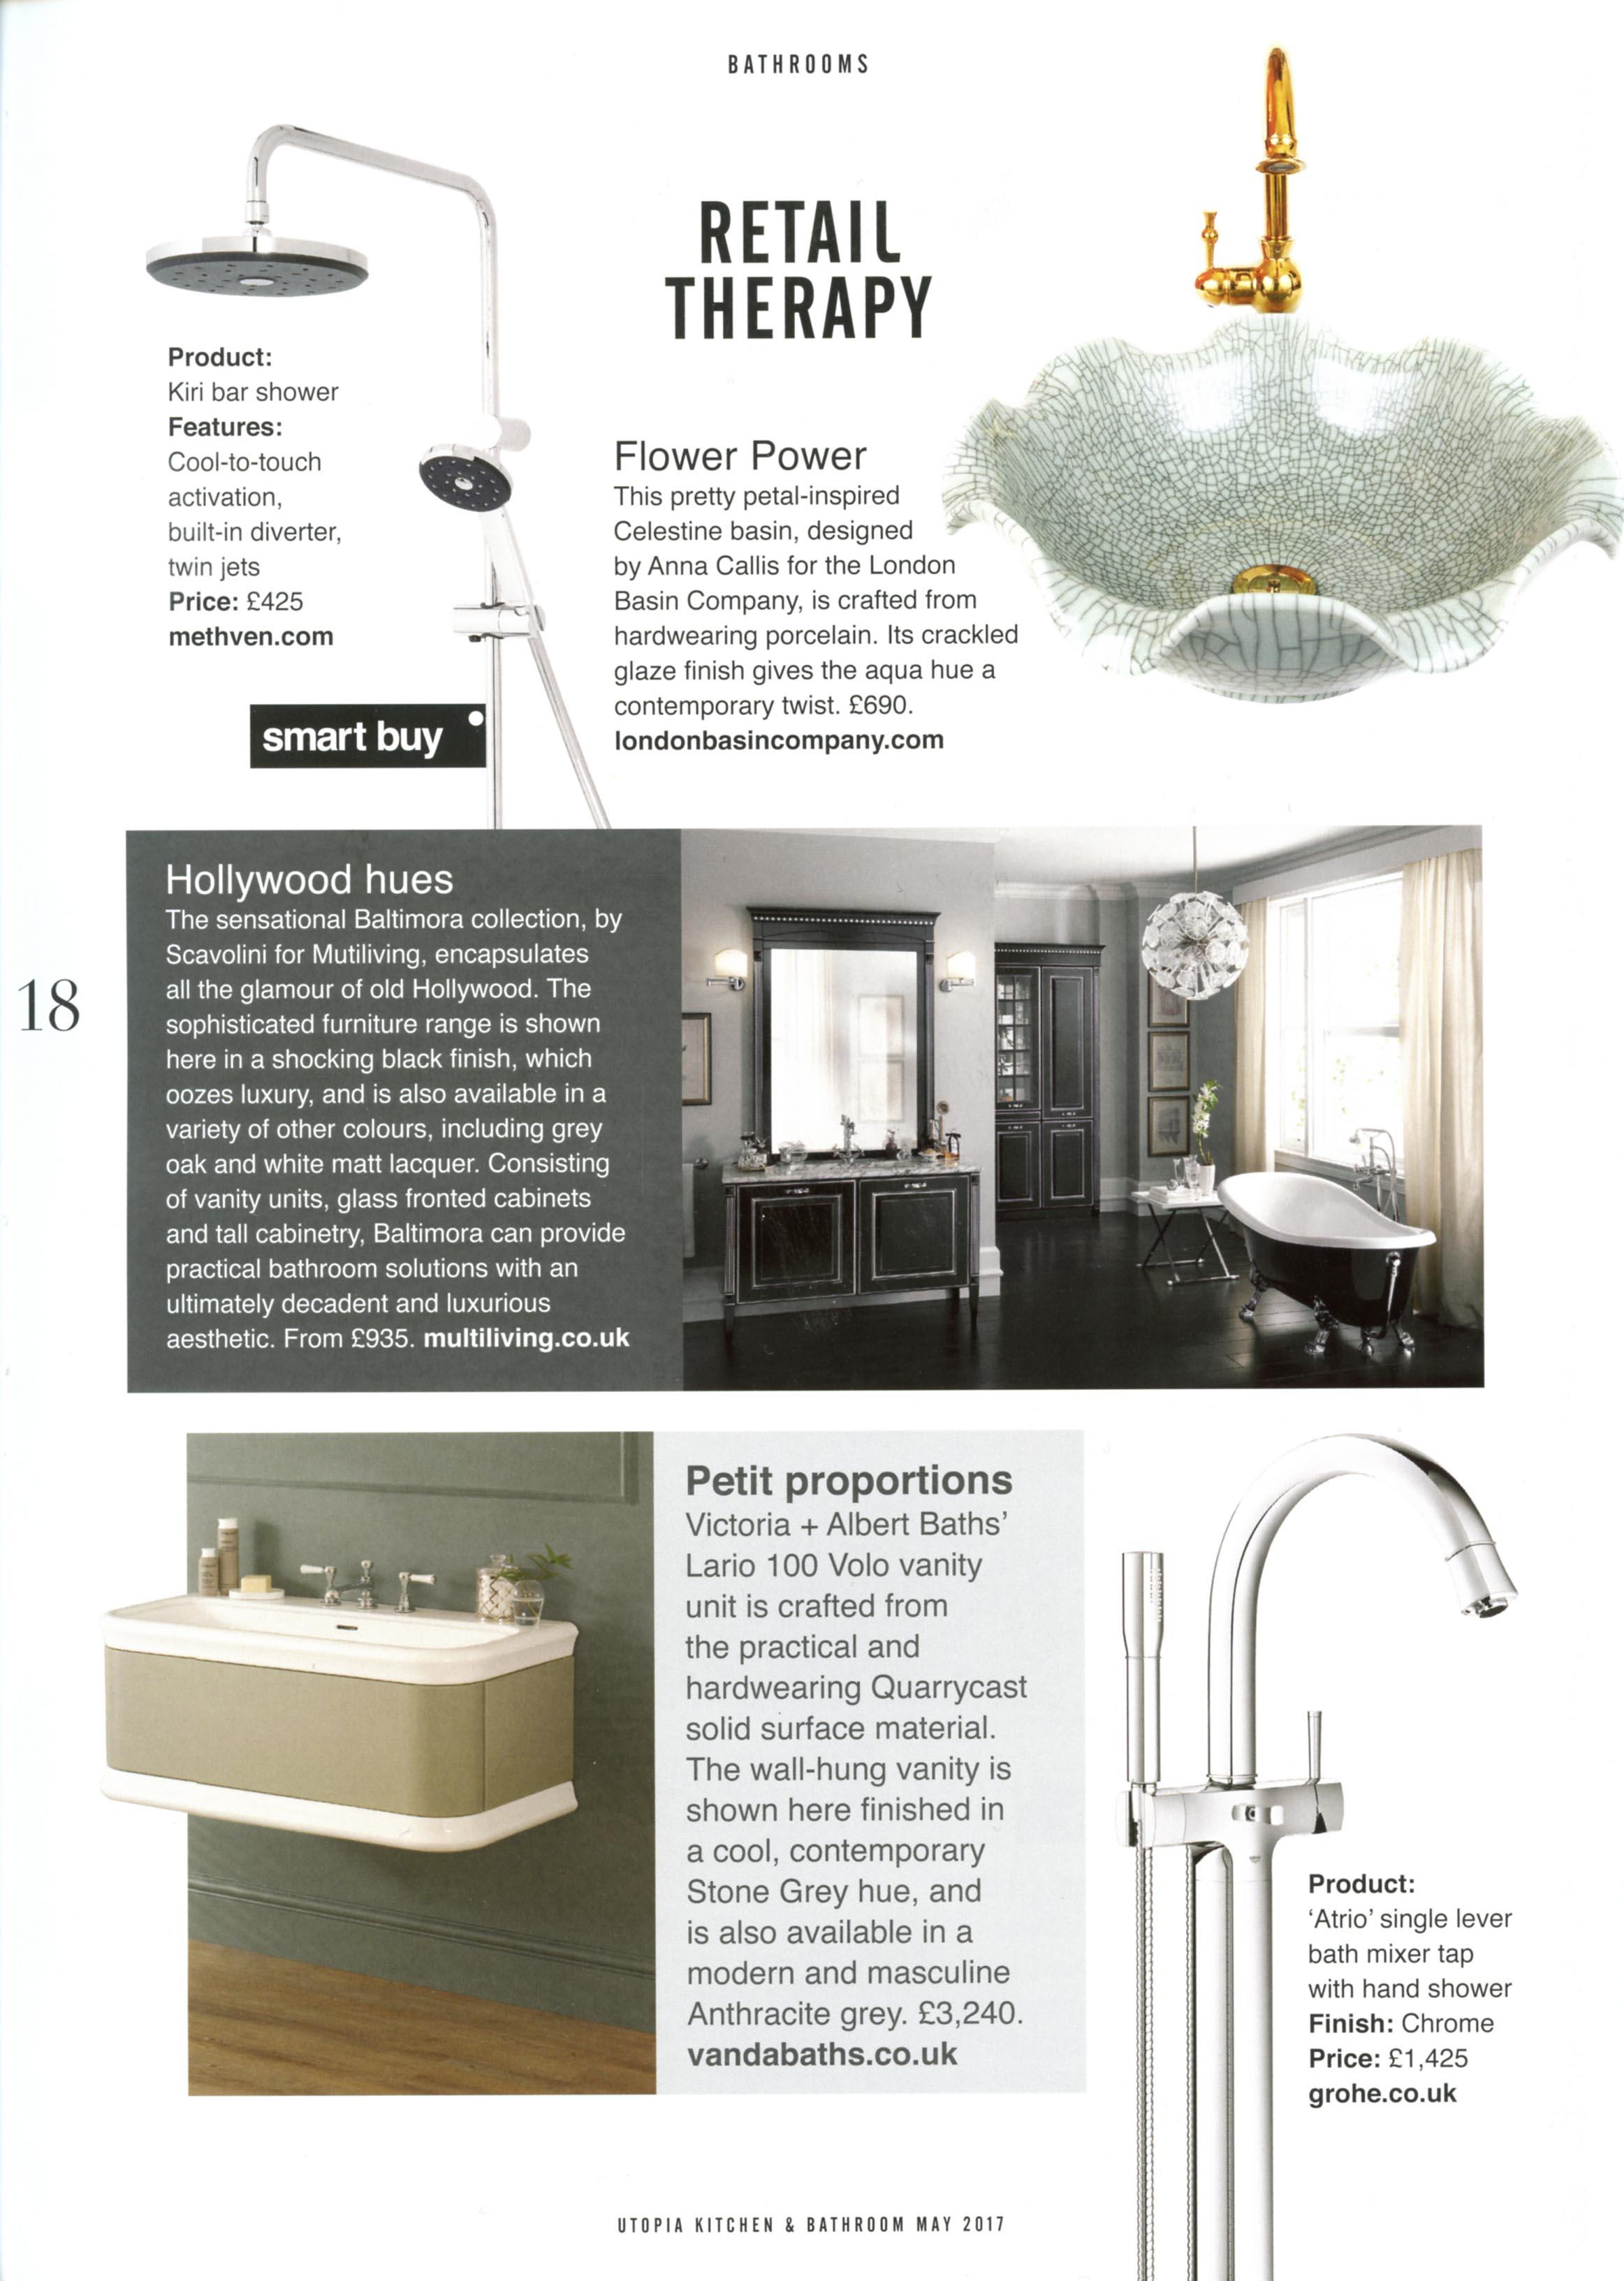 Utopia Kitchen & Bathroom May 2017 LBC.jpg